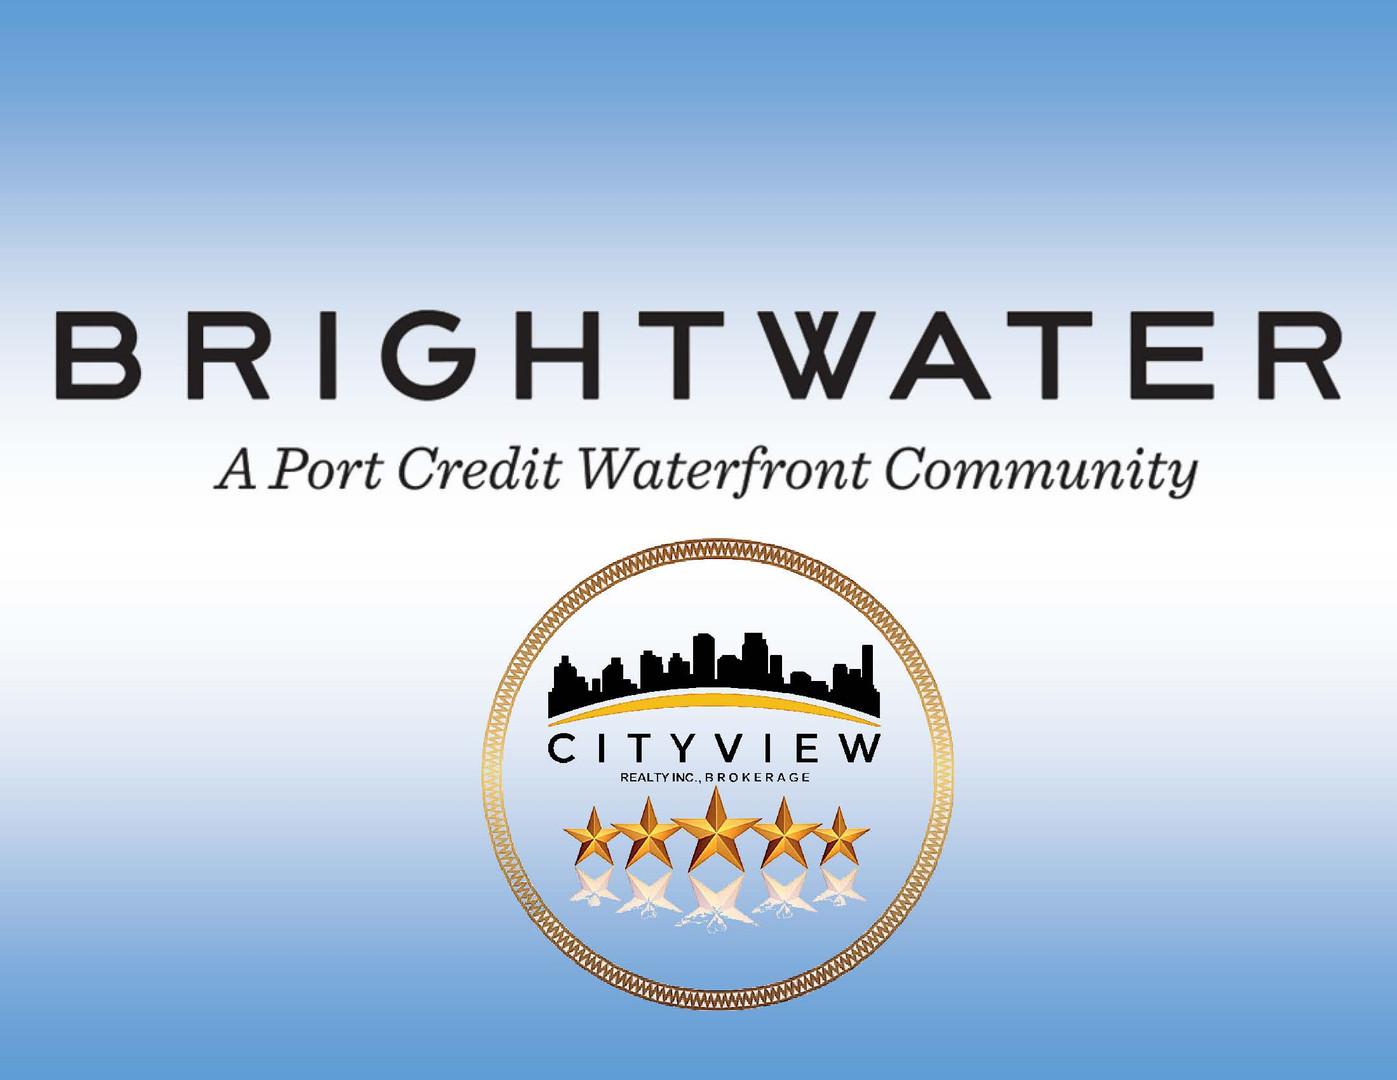 Brightwater_CITYVIEW (8).jpg